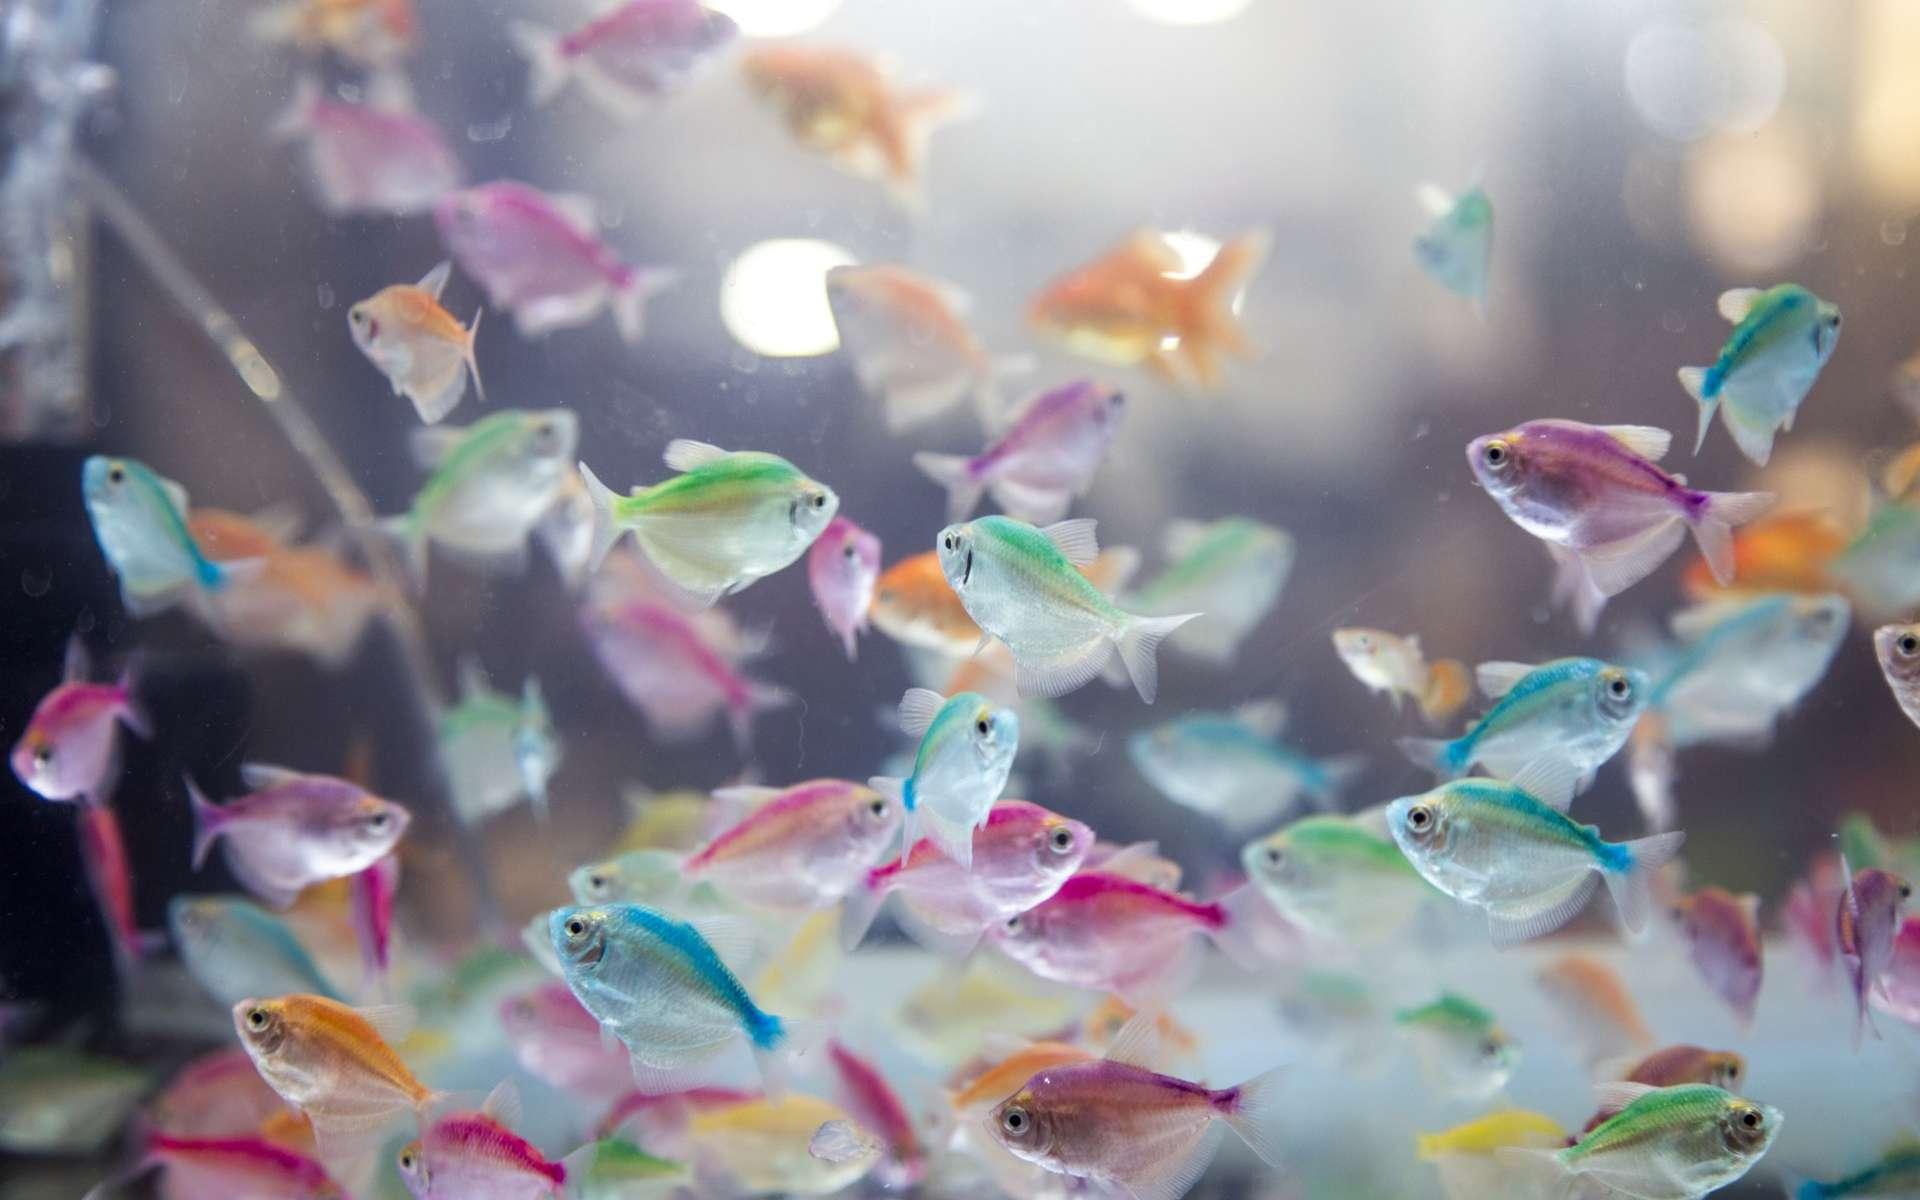 Quel est le plus petit poisson vivant au monde ? © yanukit raiva/EyeEm, Adobe Stock